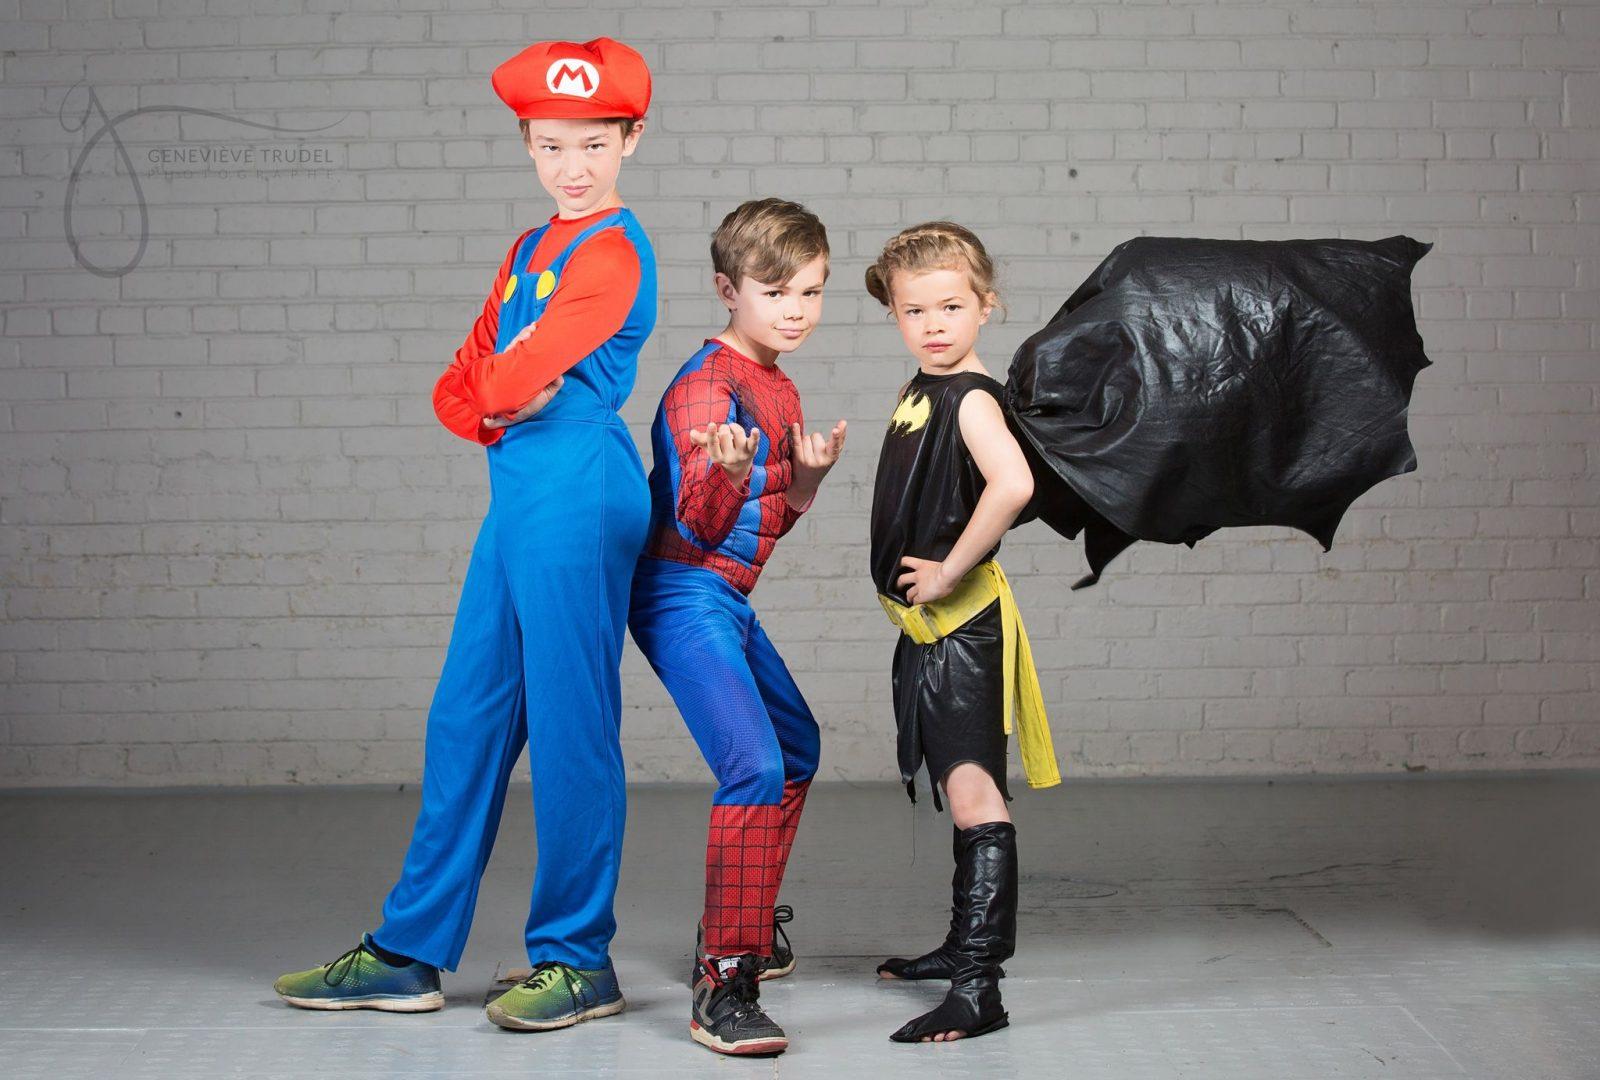 Leucan innove avec les Tirelires virtuelles d'Halloween